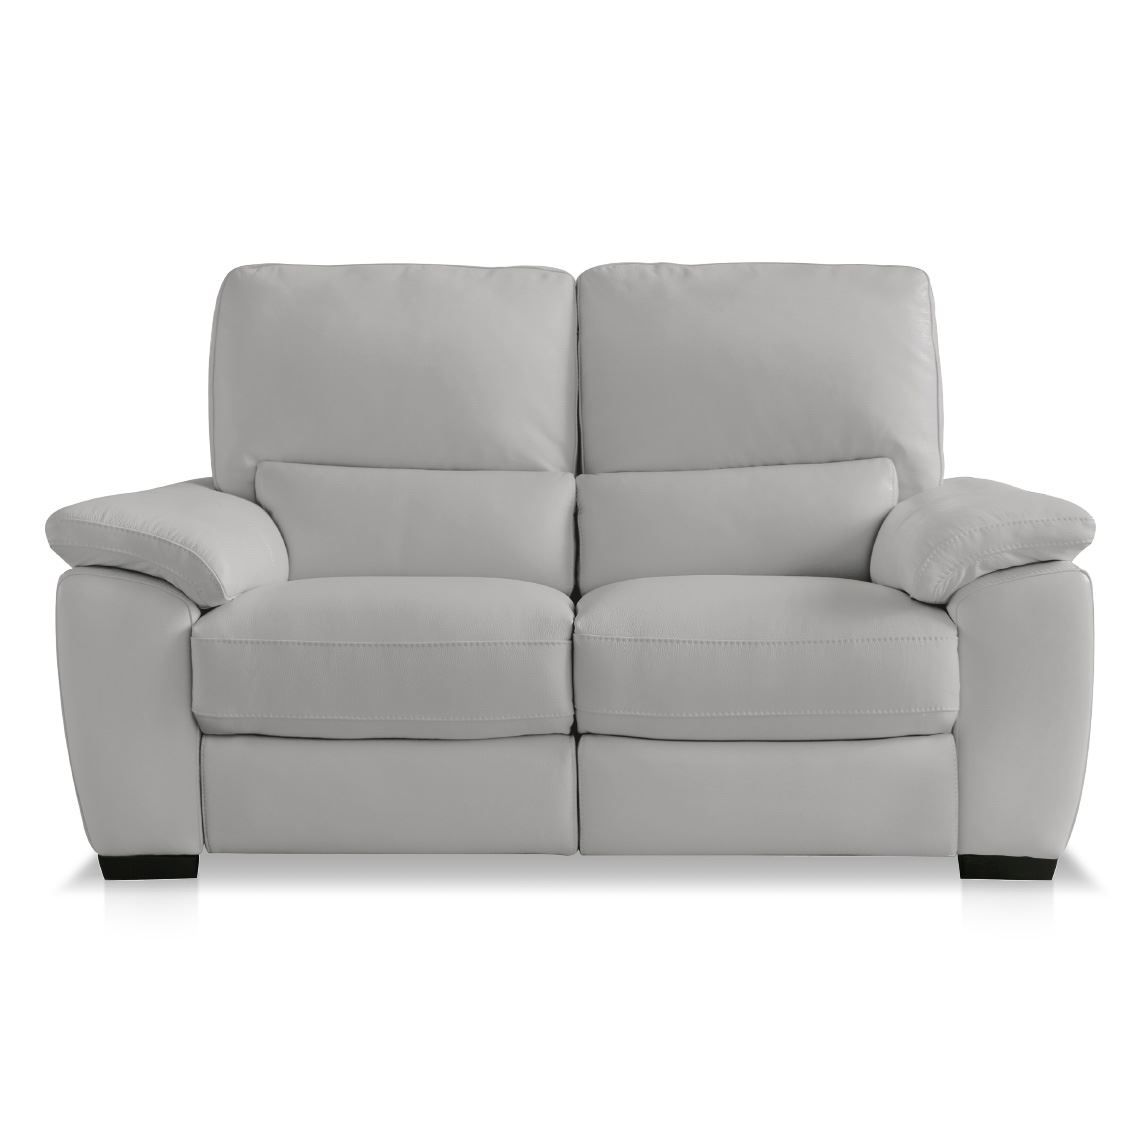 Washington Recliner 2 Seat Leather Sofa Silver Grey Leather Sofa Sofa Furniture